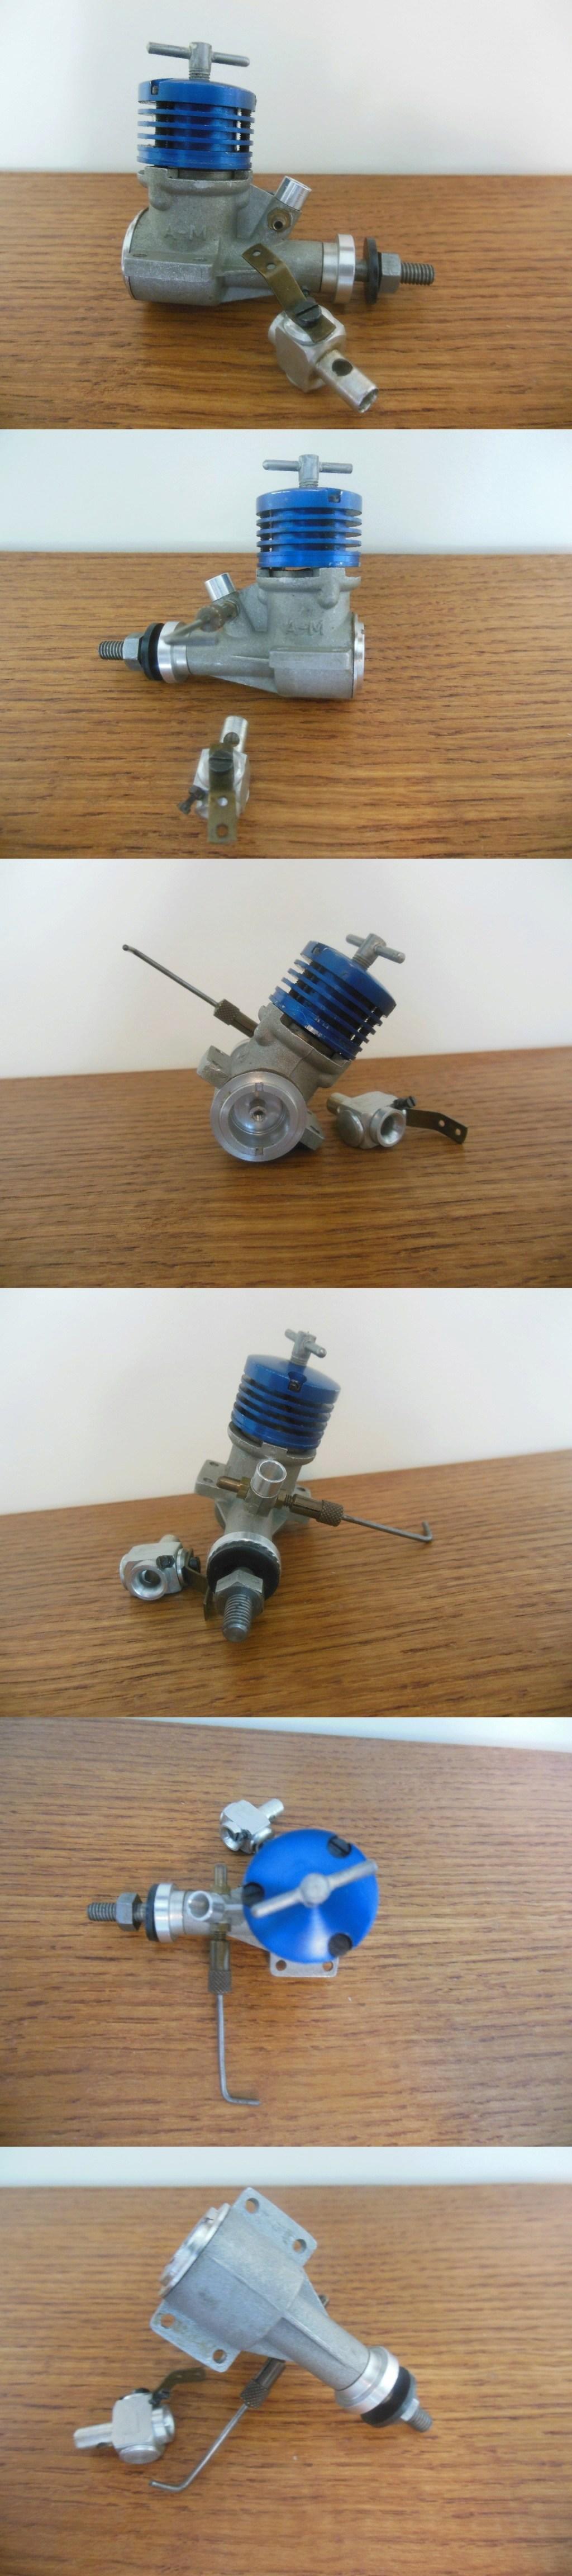 AM15 1.5cc Diesel Engine Am15_f10